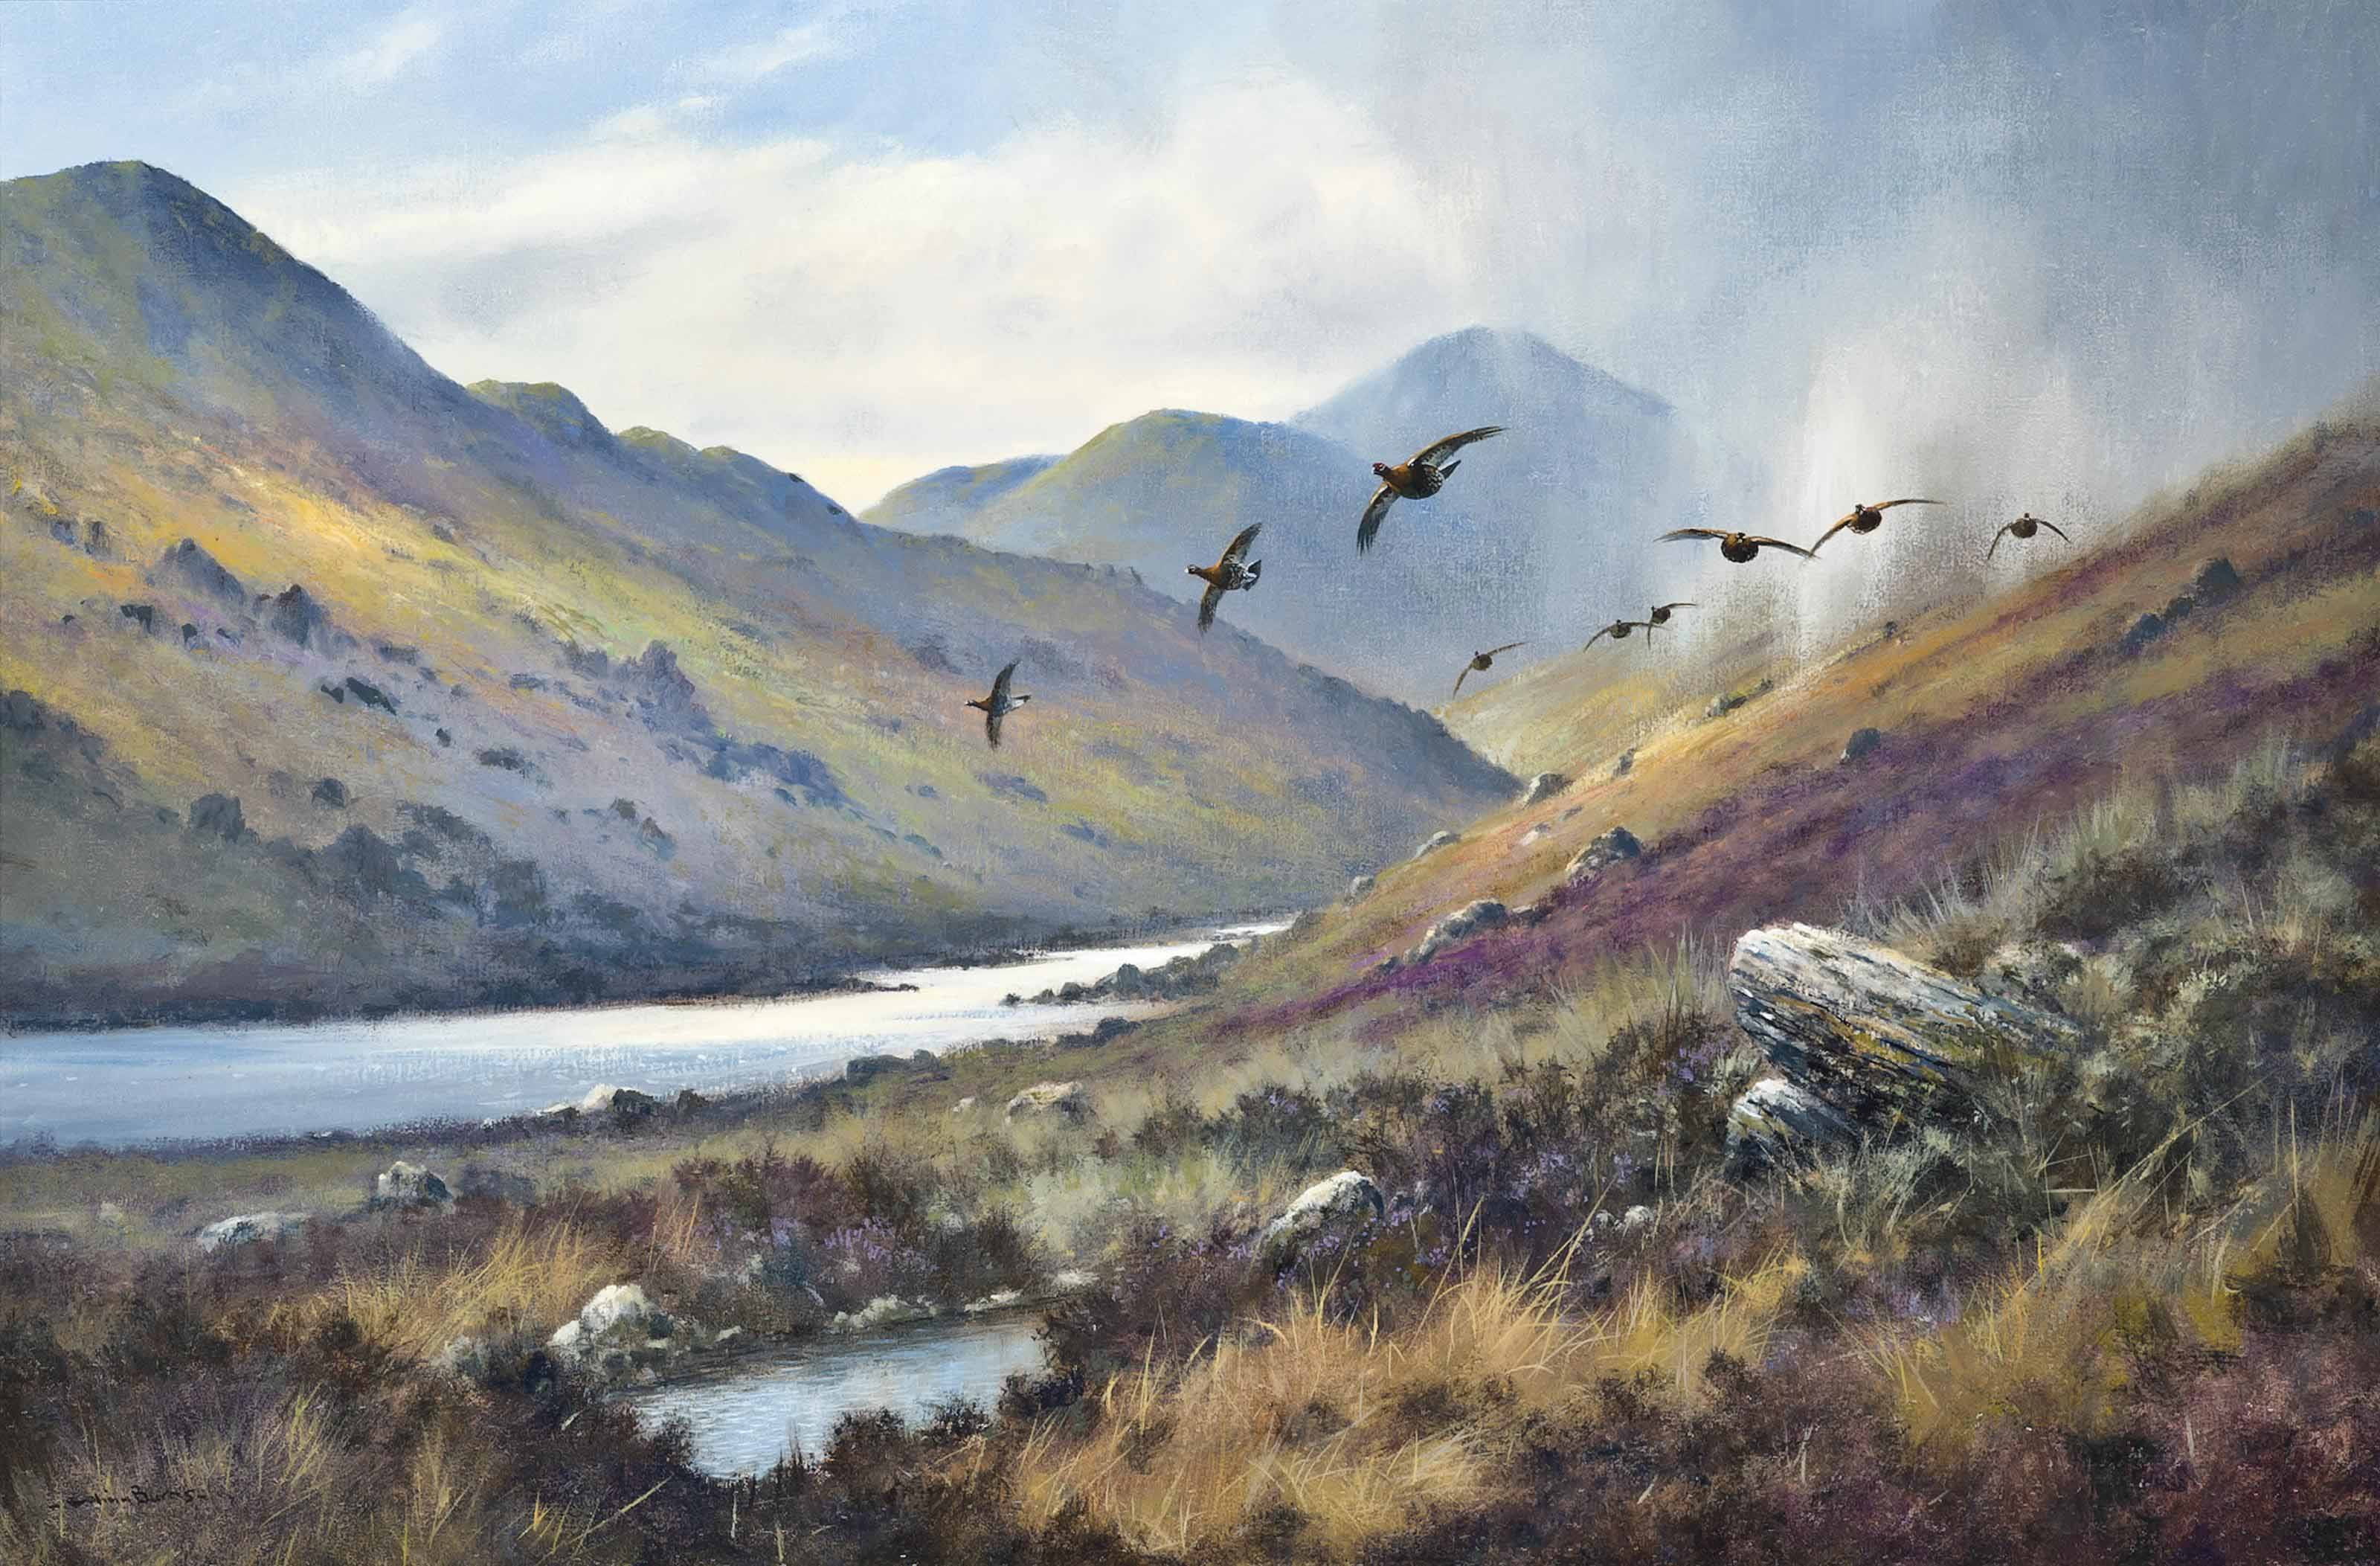 Red grouse, Loch Mallardoch, Scotland